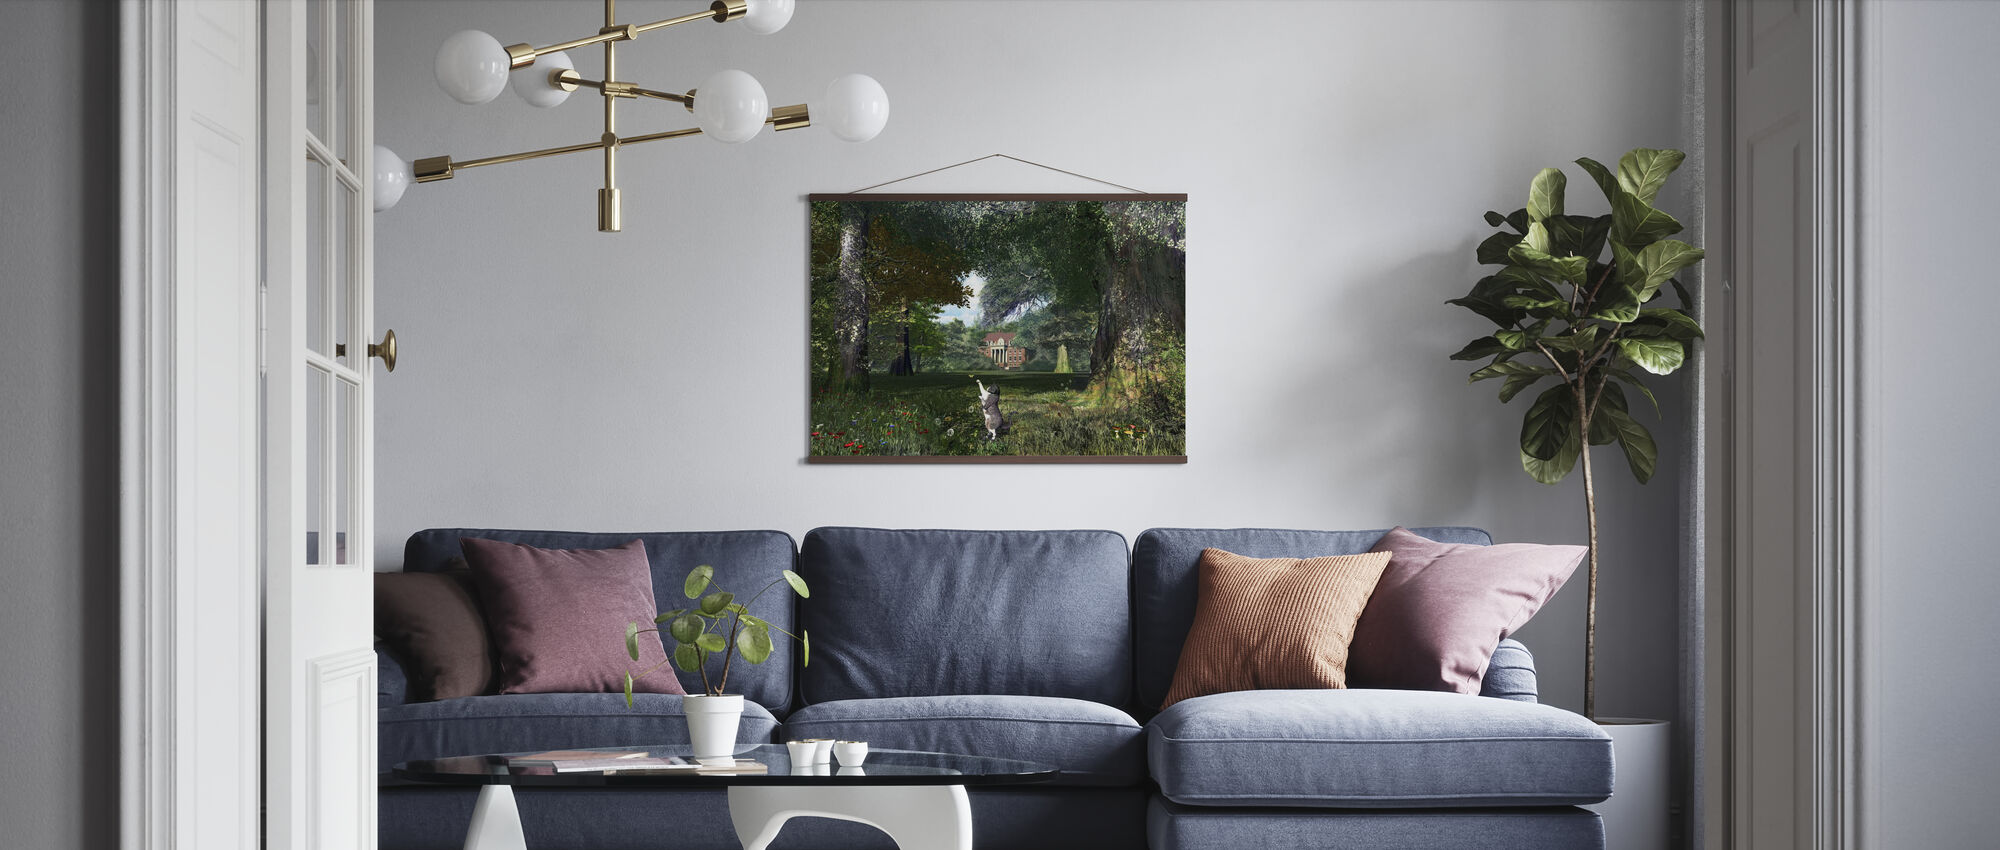 Tree Cat - Poster - Living Room